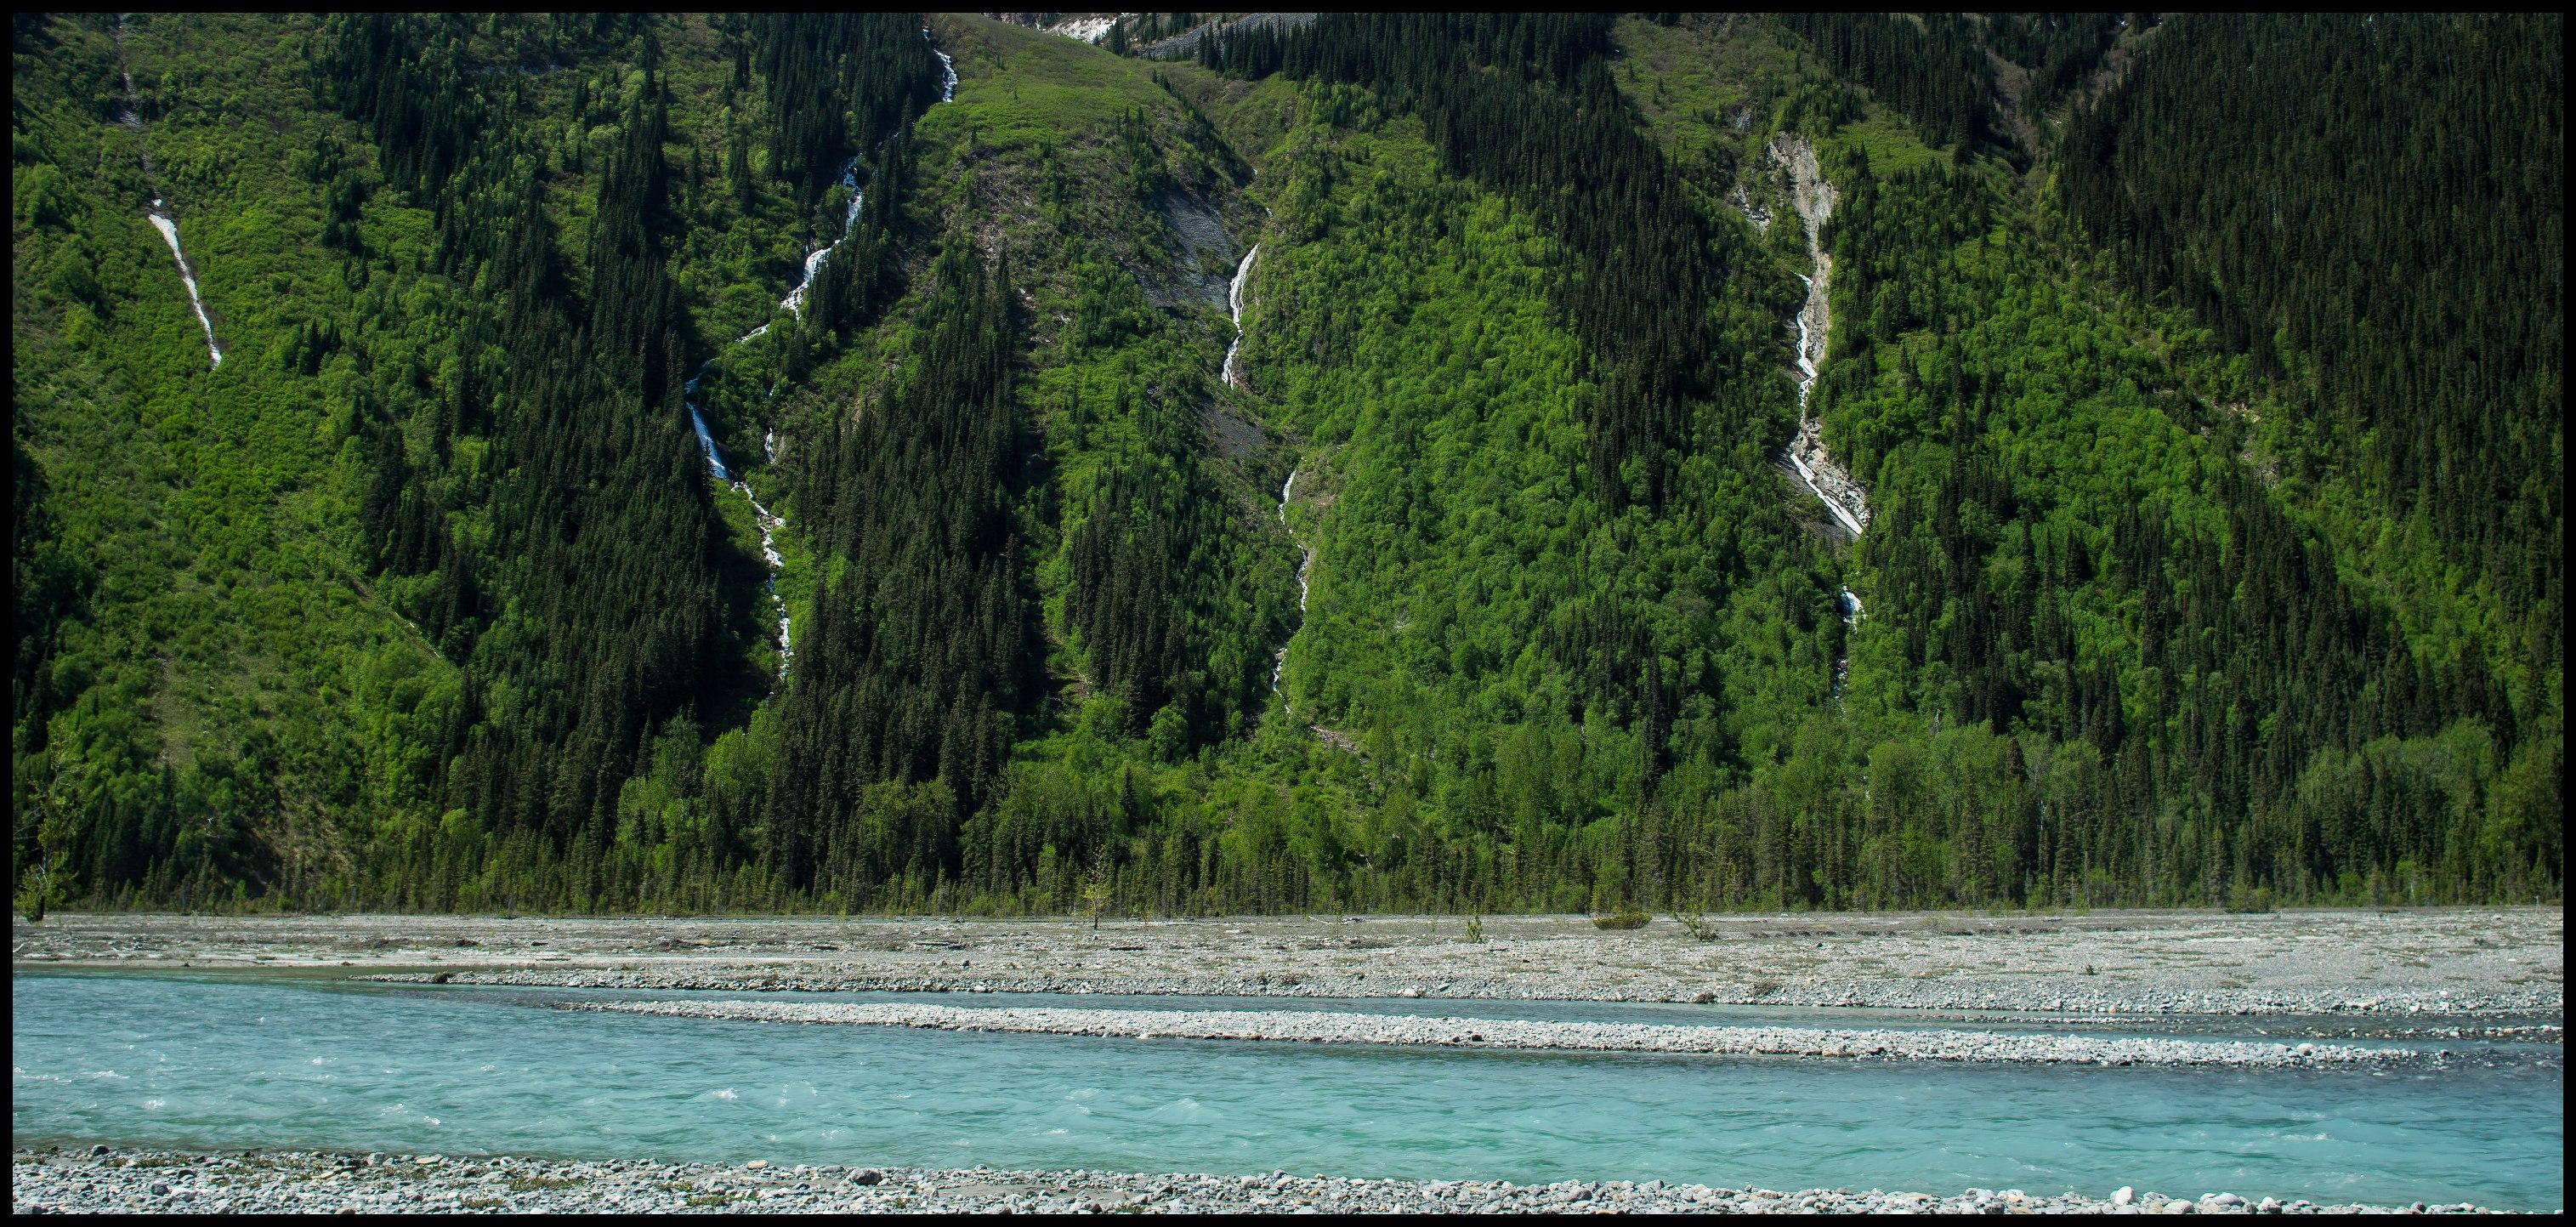 Spring scenery of Berg Lake trail Sony A7 / Canon FD Tilt Shift 35 2.8